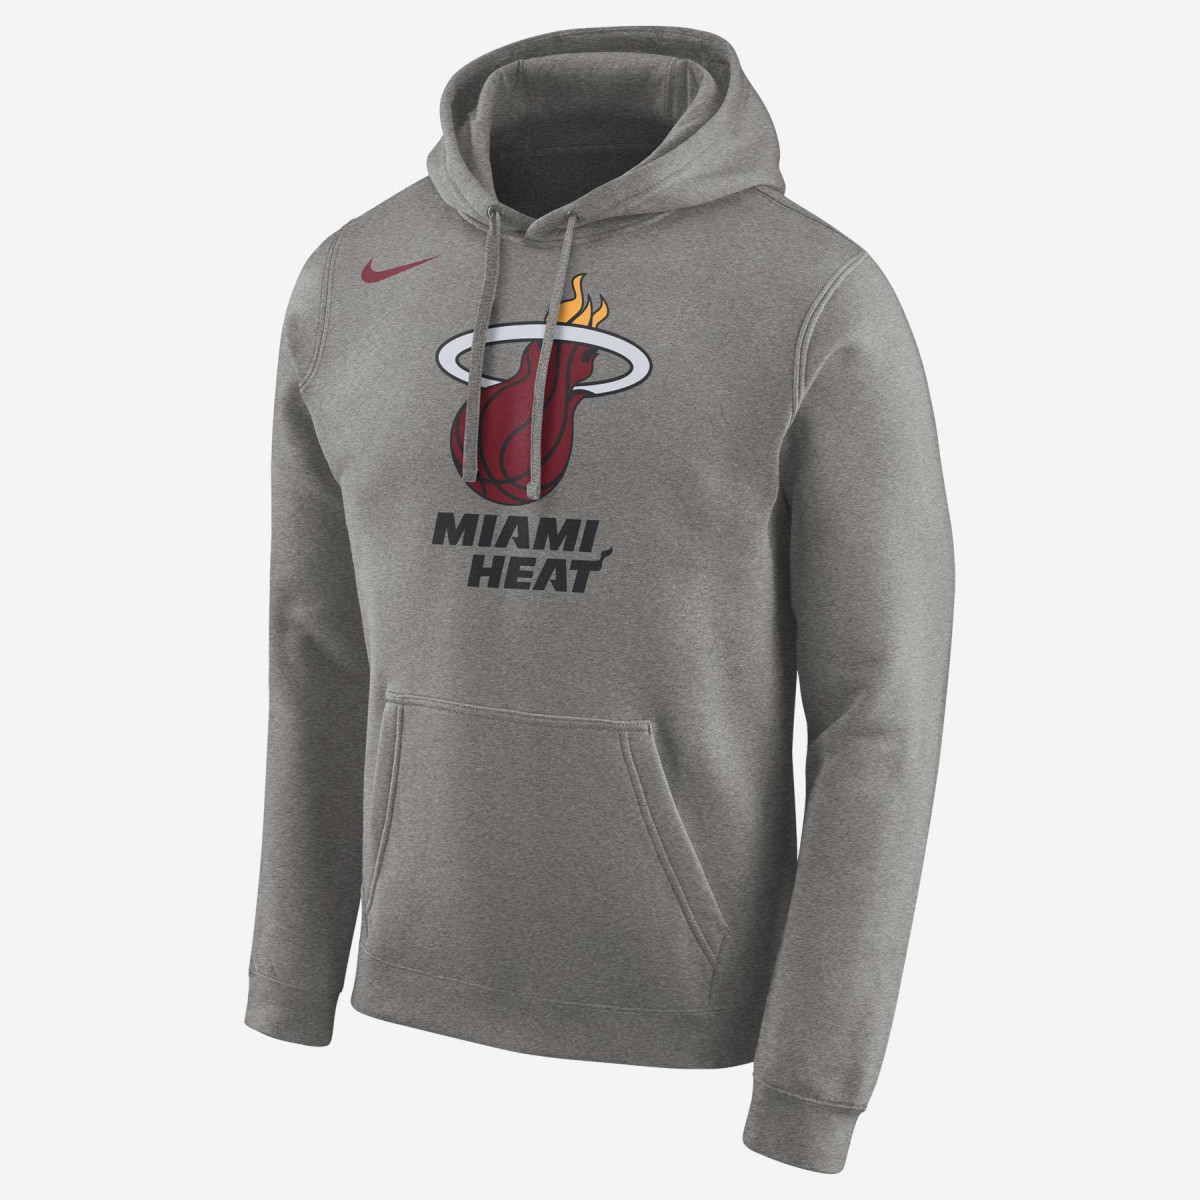 brand new d4e8c 78d97 Nike NBA Miami Heat Hoodie - NBA Shop Miami Heat Merchandise ...